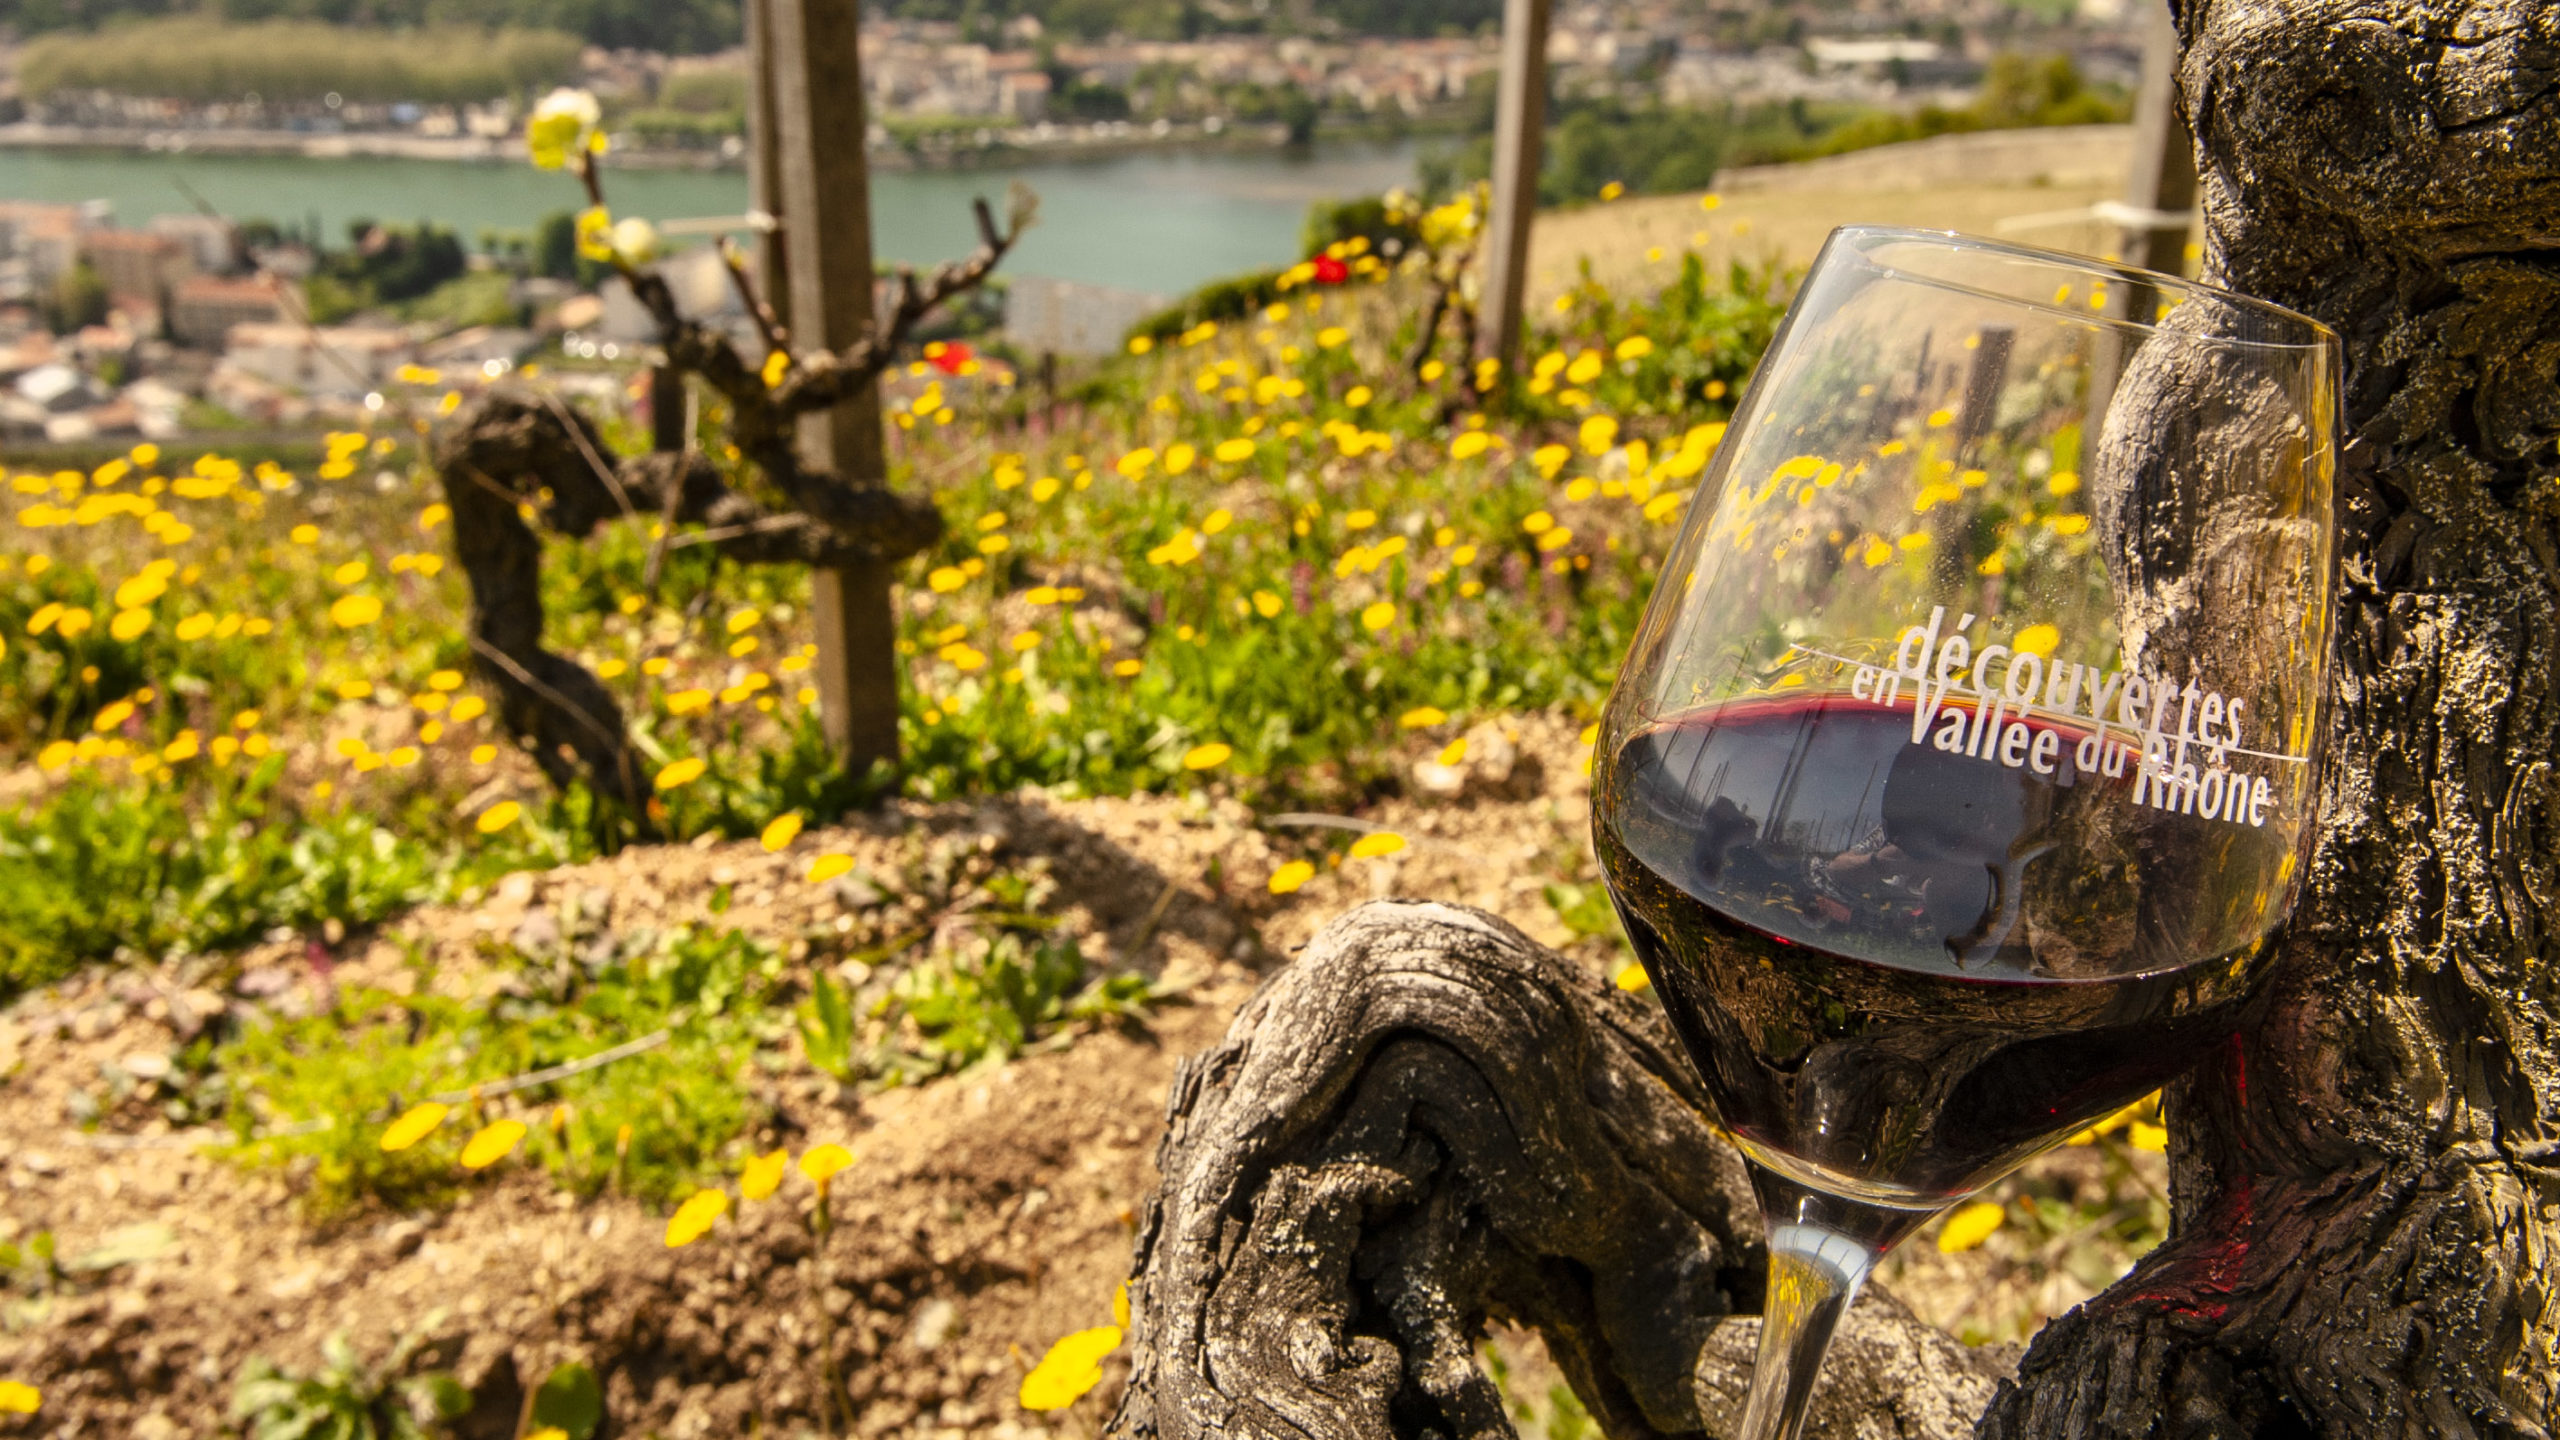 Messe der Weinregion: die Découvertes de la Vallée du Rhône. Foto: Hilke Maunder